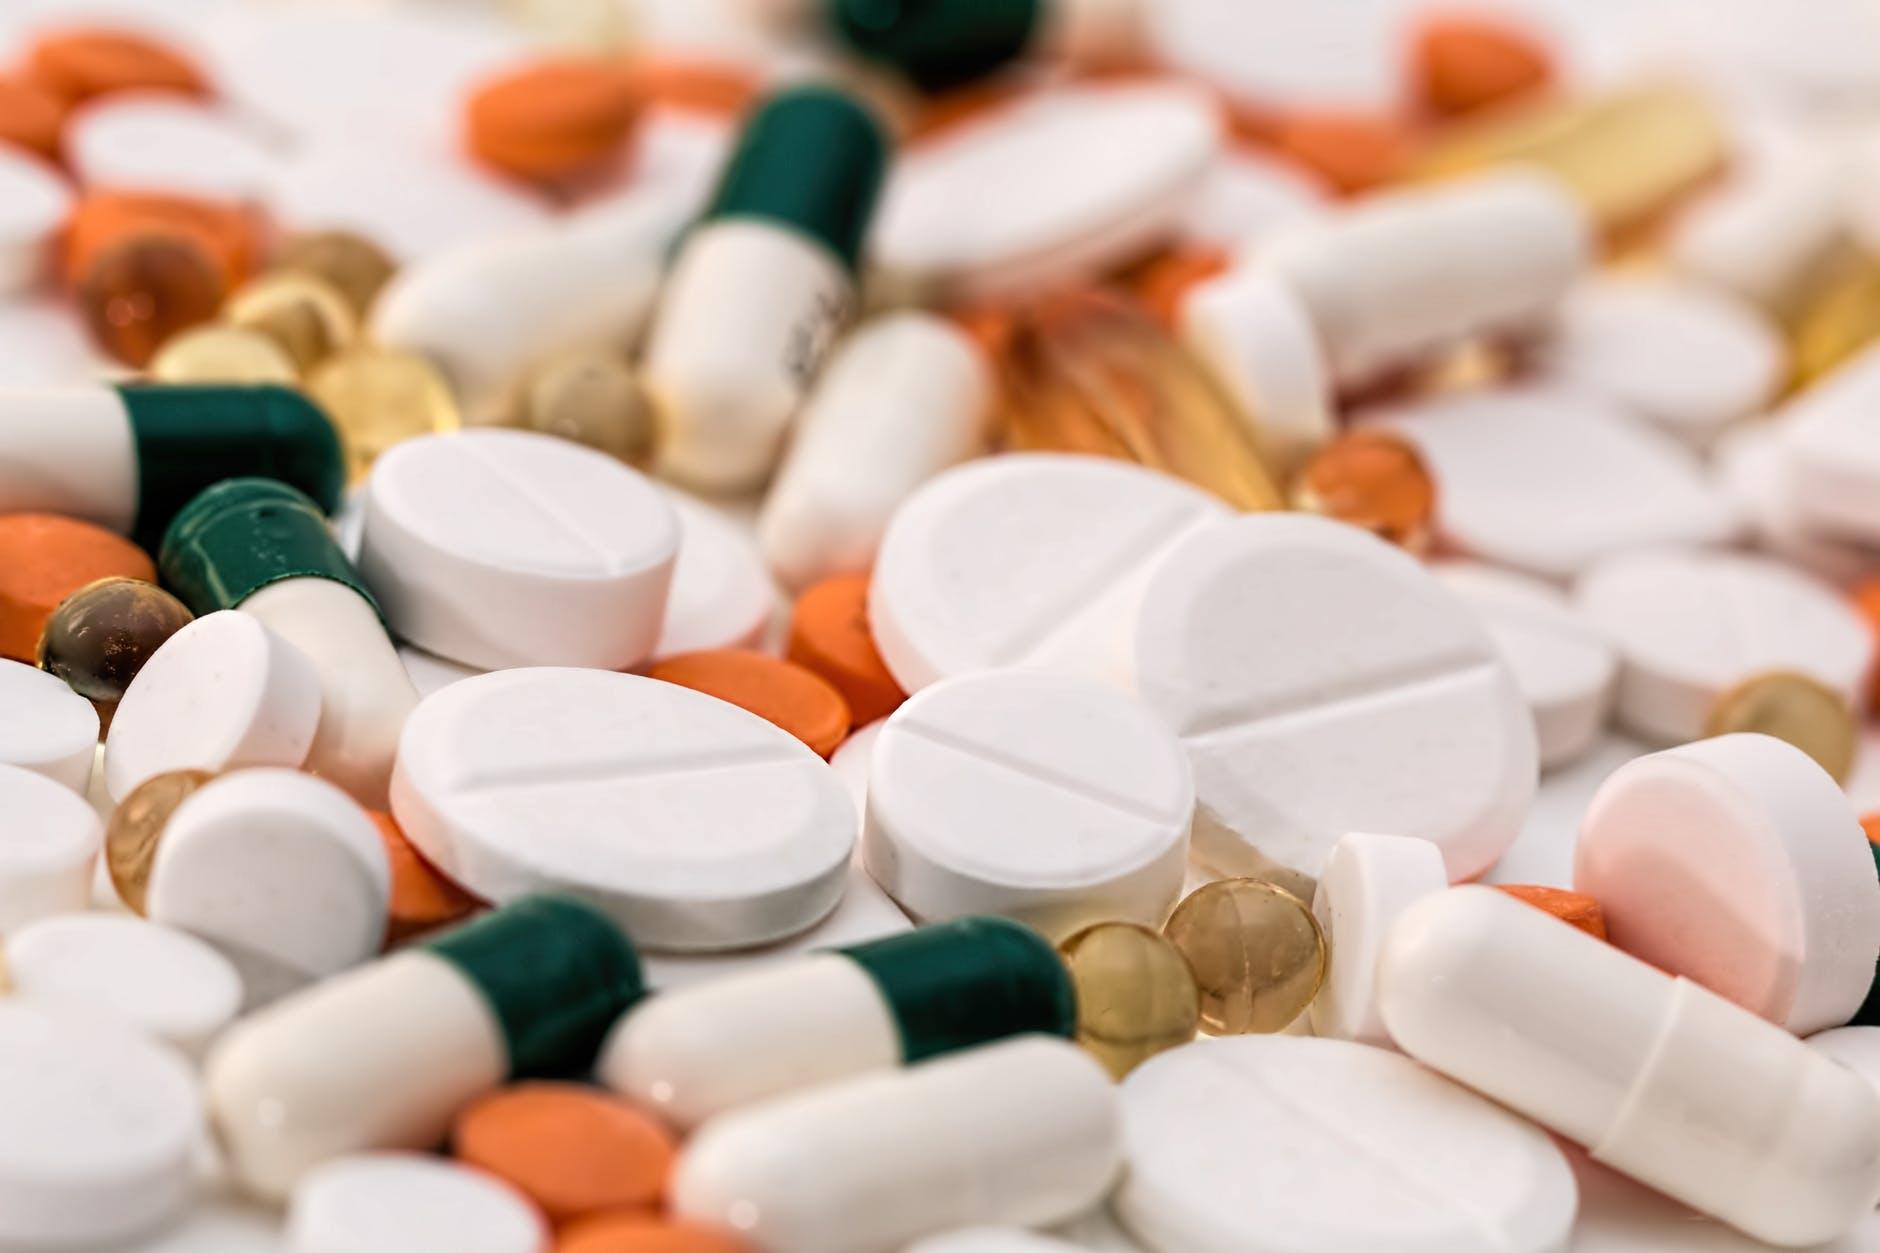 headache pain pills medication 159211